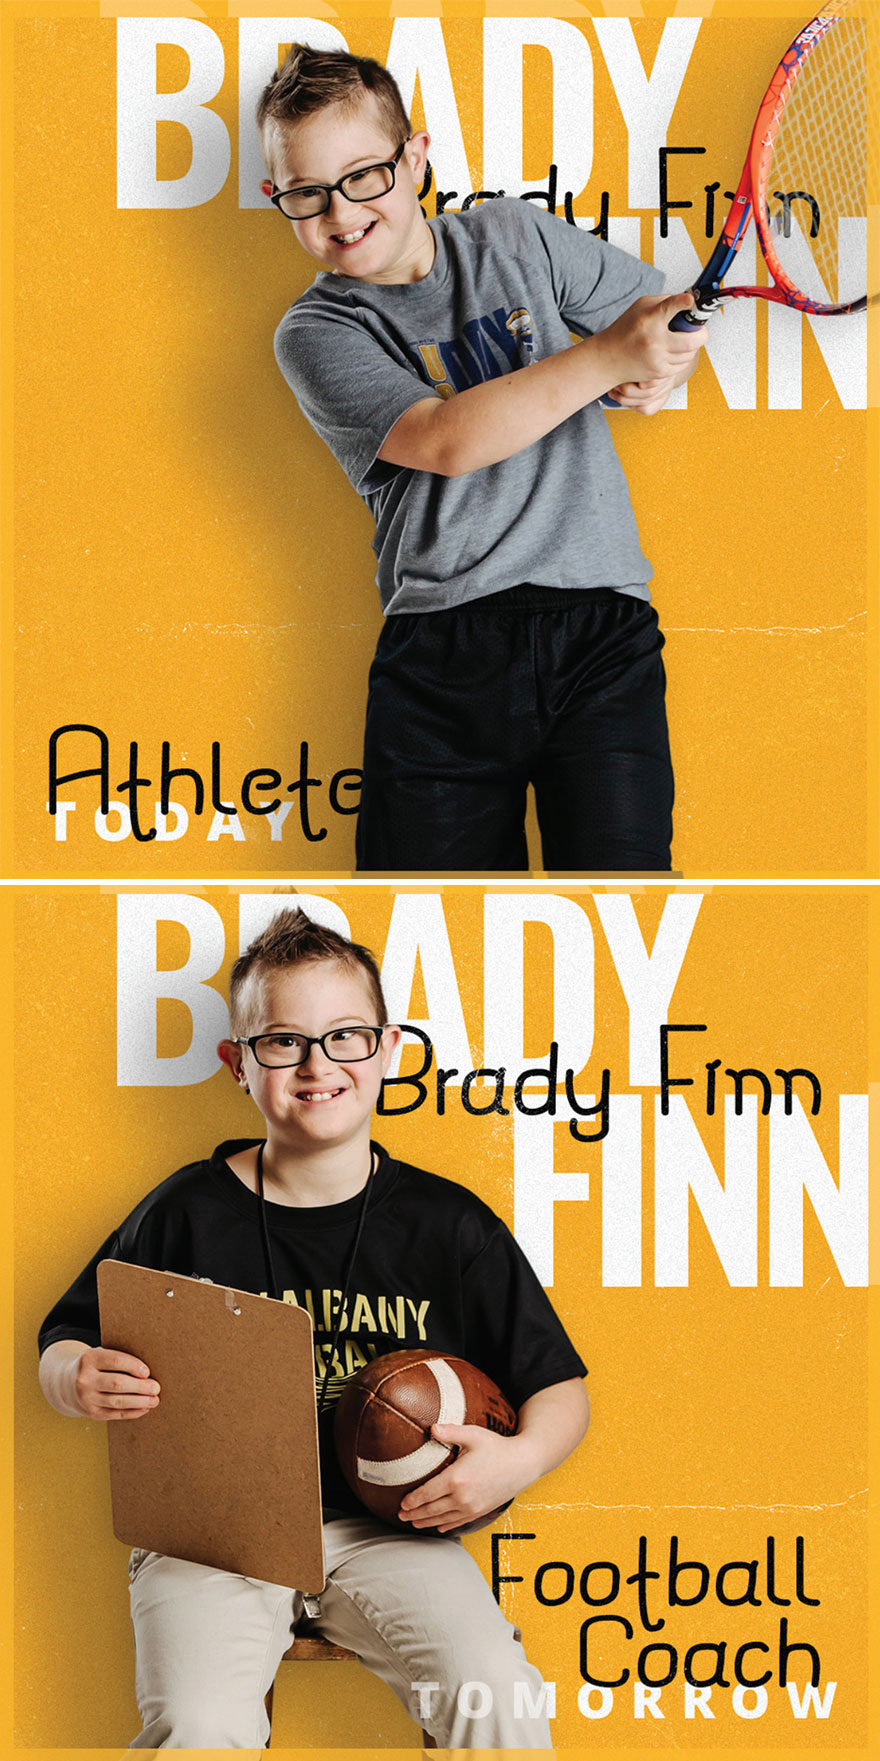 Brady Finn, Football Coach